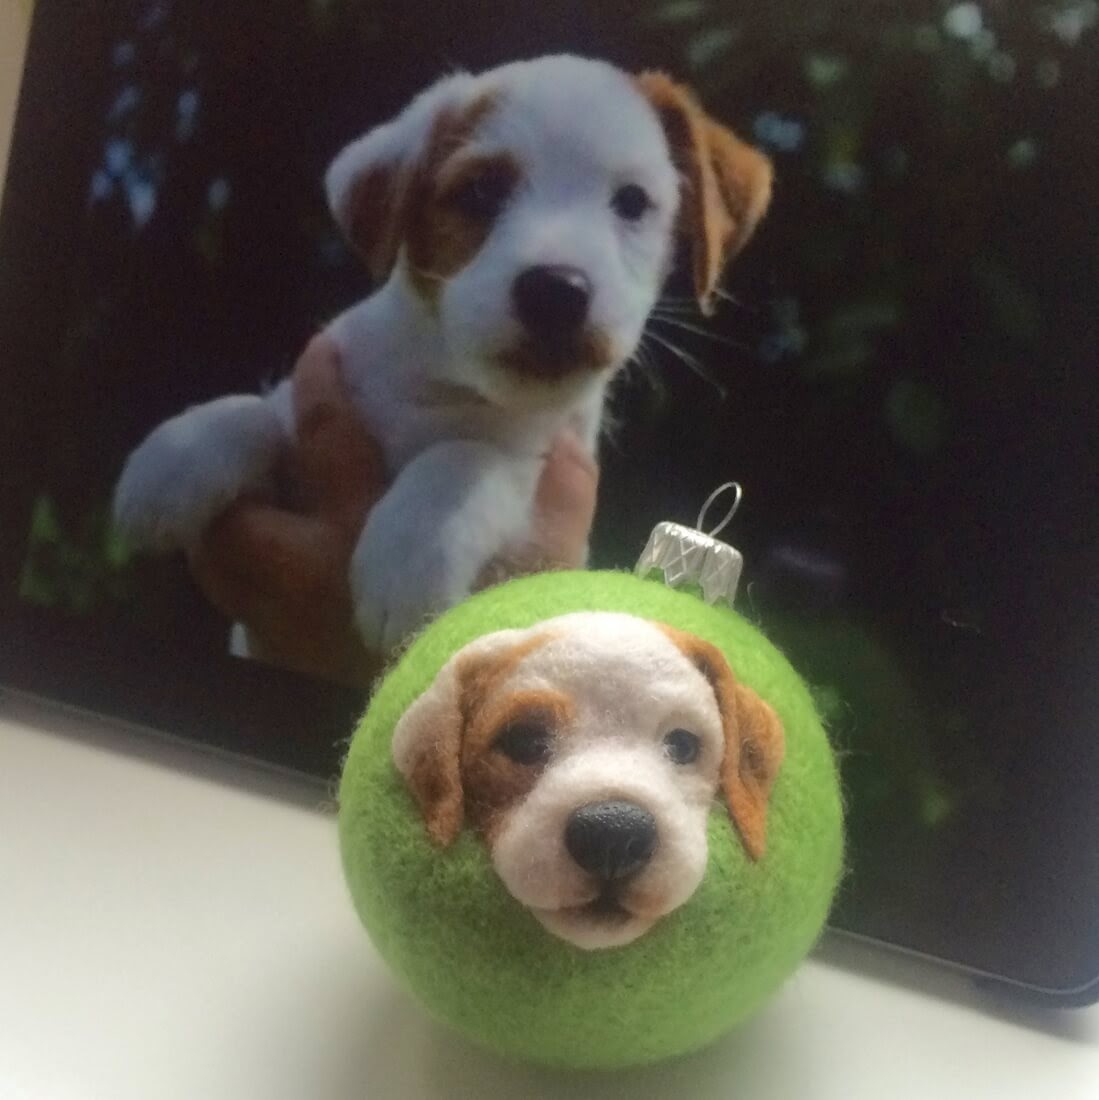 14-Jack-Russell-Puppy-Hanna-Tsukanova-3D-Dogs-&-Cats-Felt-Pet-Portraits-www-designstack-co